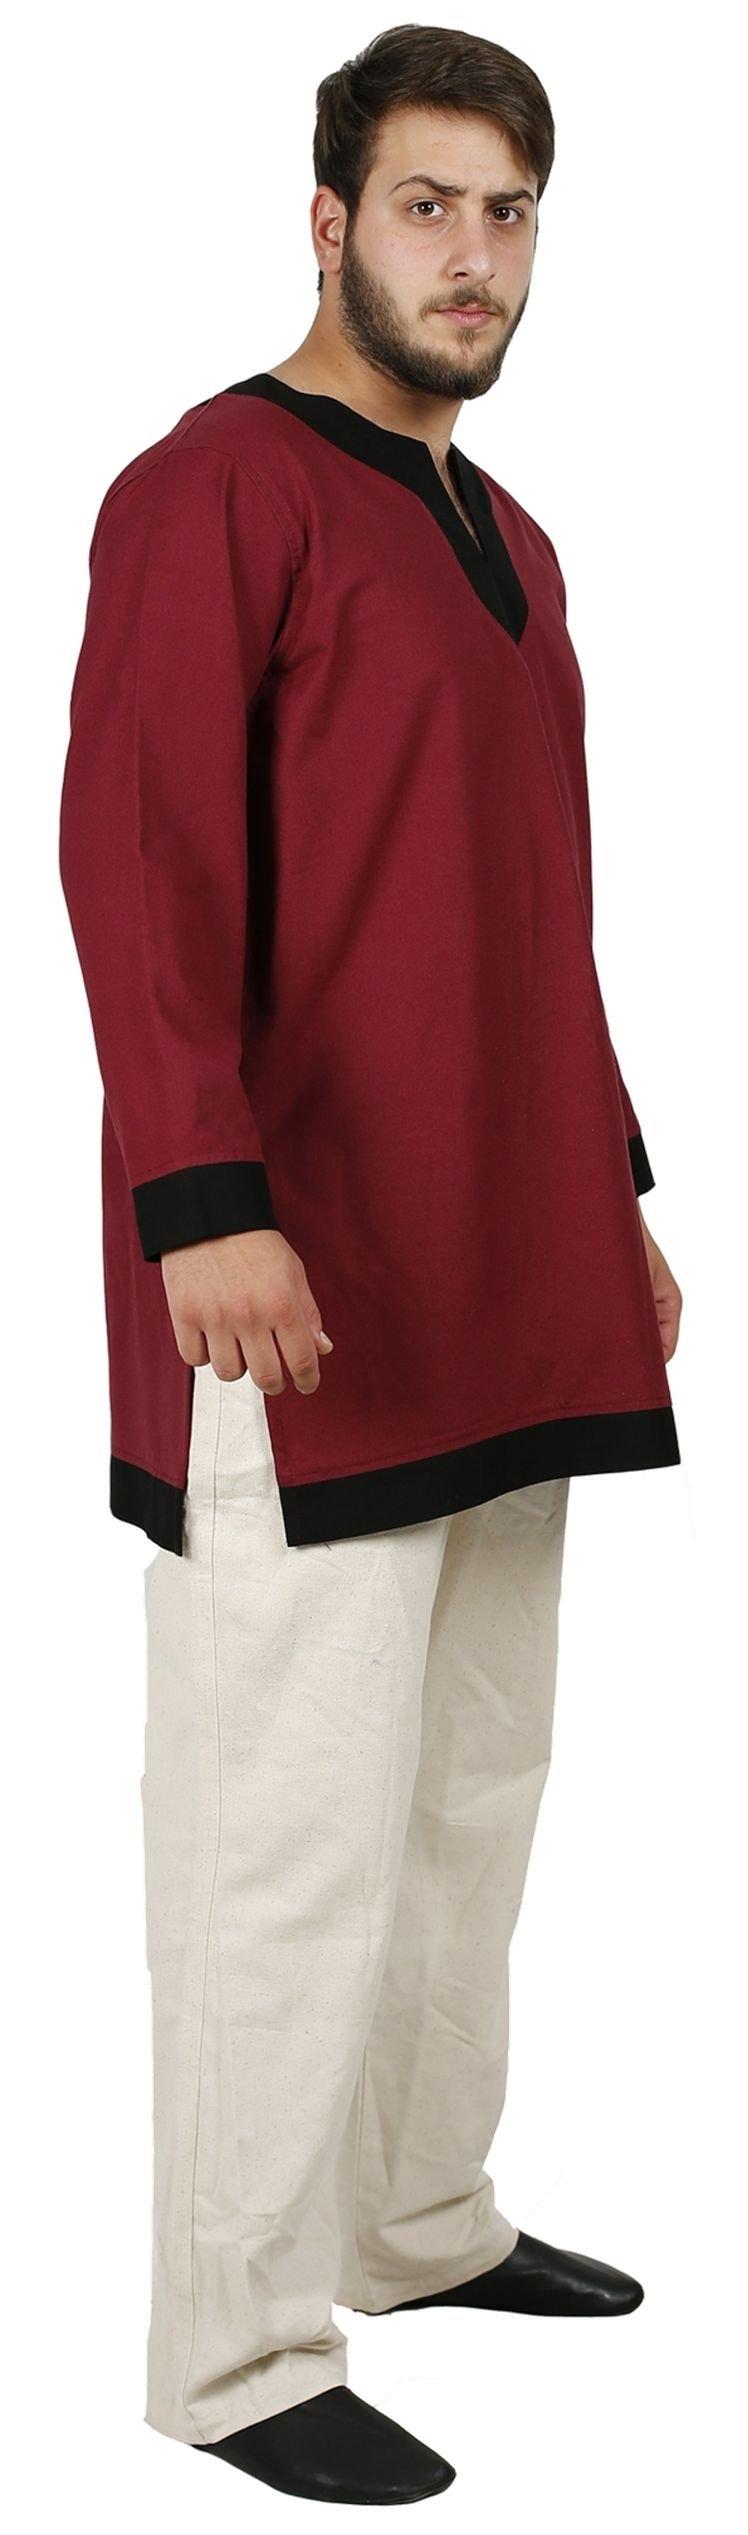 byCalvina - Calvina Costumes Arthur Medieval Viking LARP Renaissance Mens Cotton Tunic- Made in Turkey, L-BRG/BLC